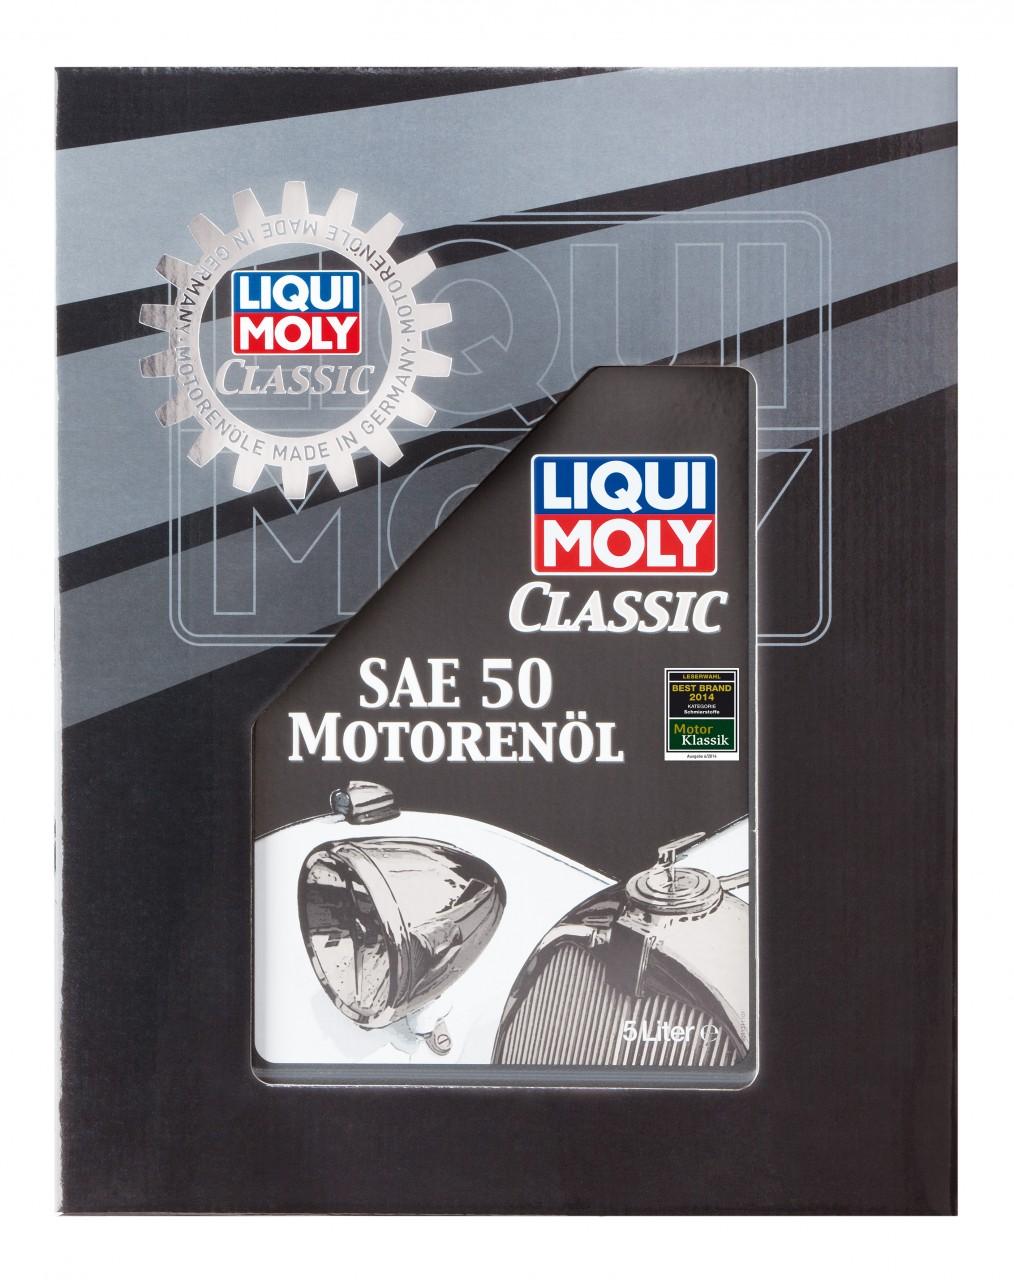 liqui moly classic motor oil sae 50 5 liter de olie. Black Bedroom Furniture Sets. Home Design Ideas